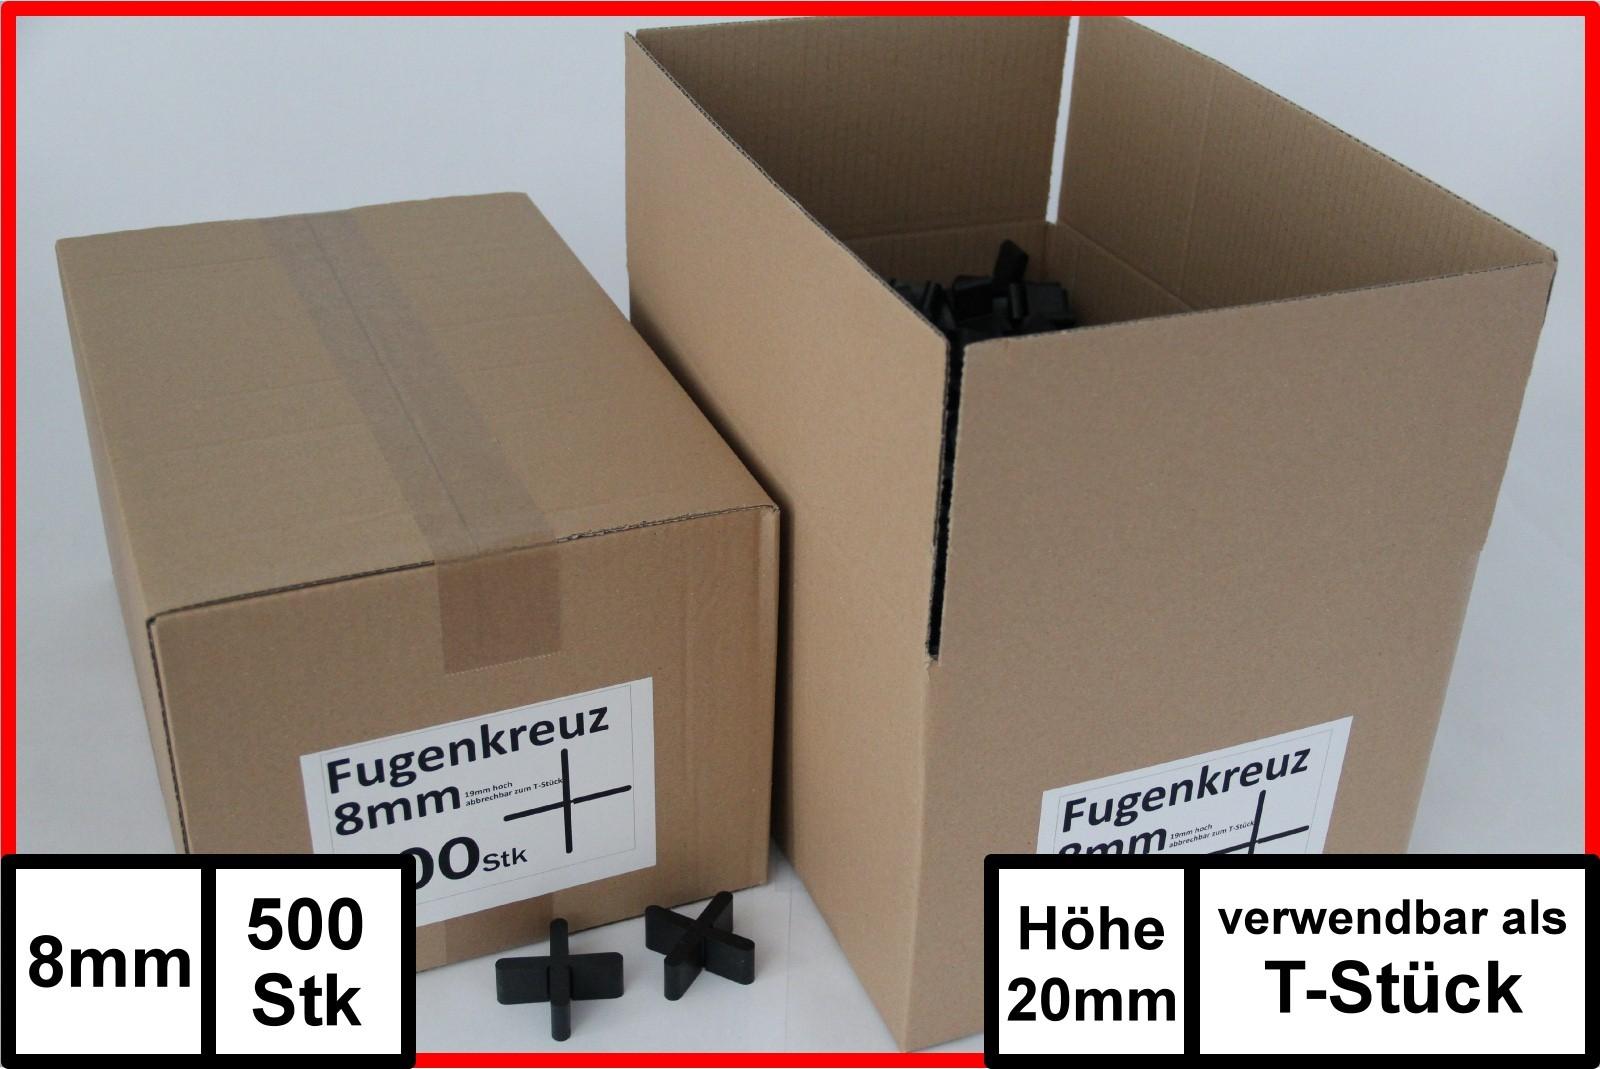 Fugenkreuze 8mm Bauh/öhe 20mm 500 St/ück im Karton